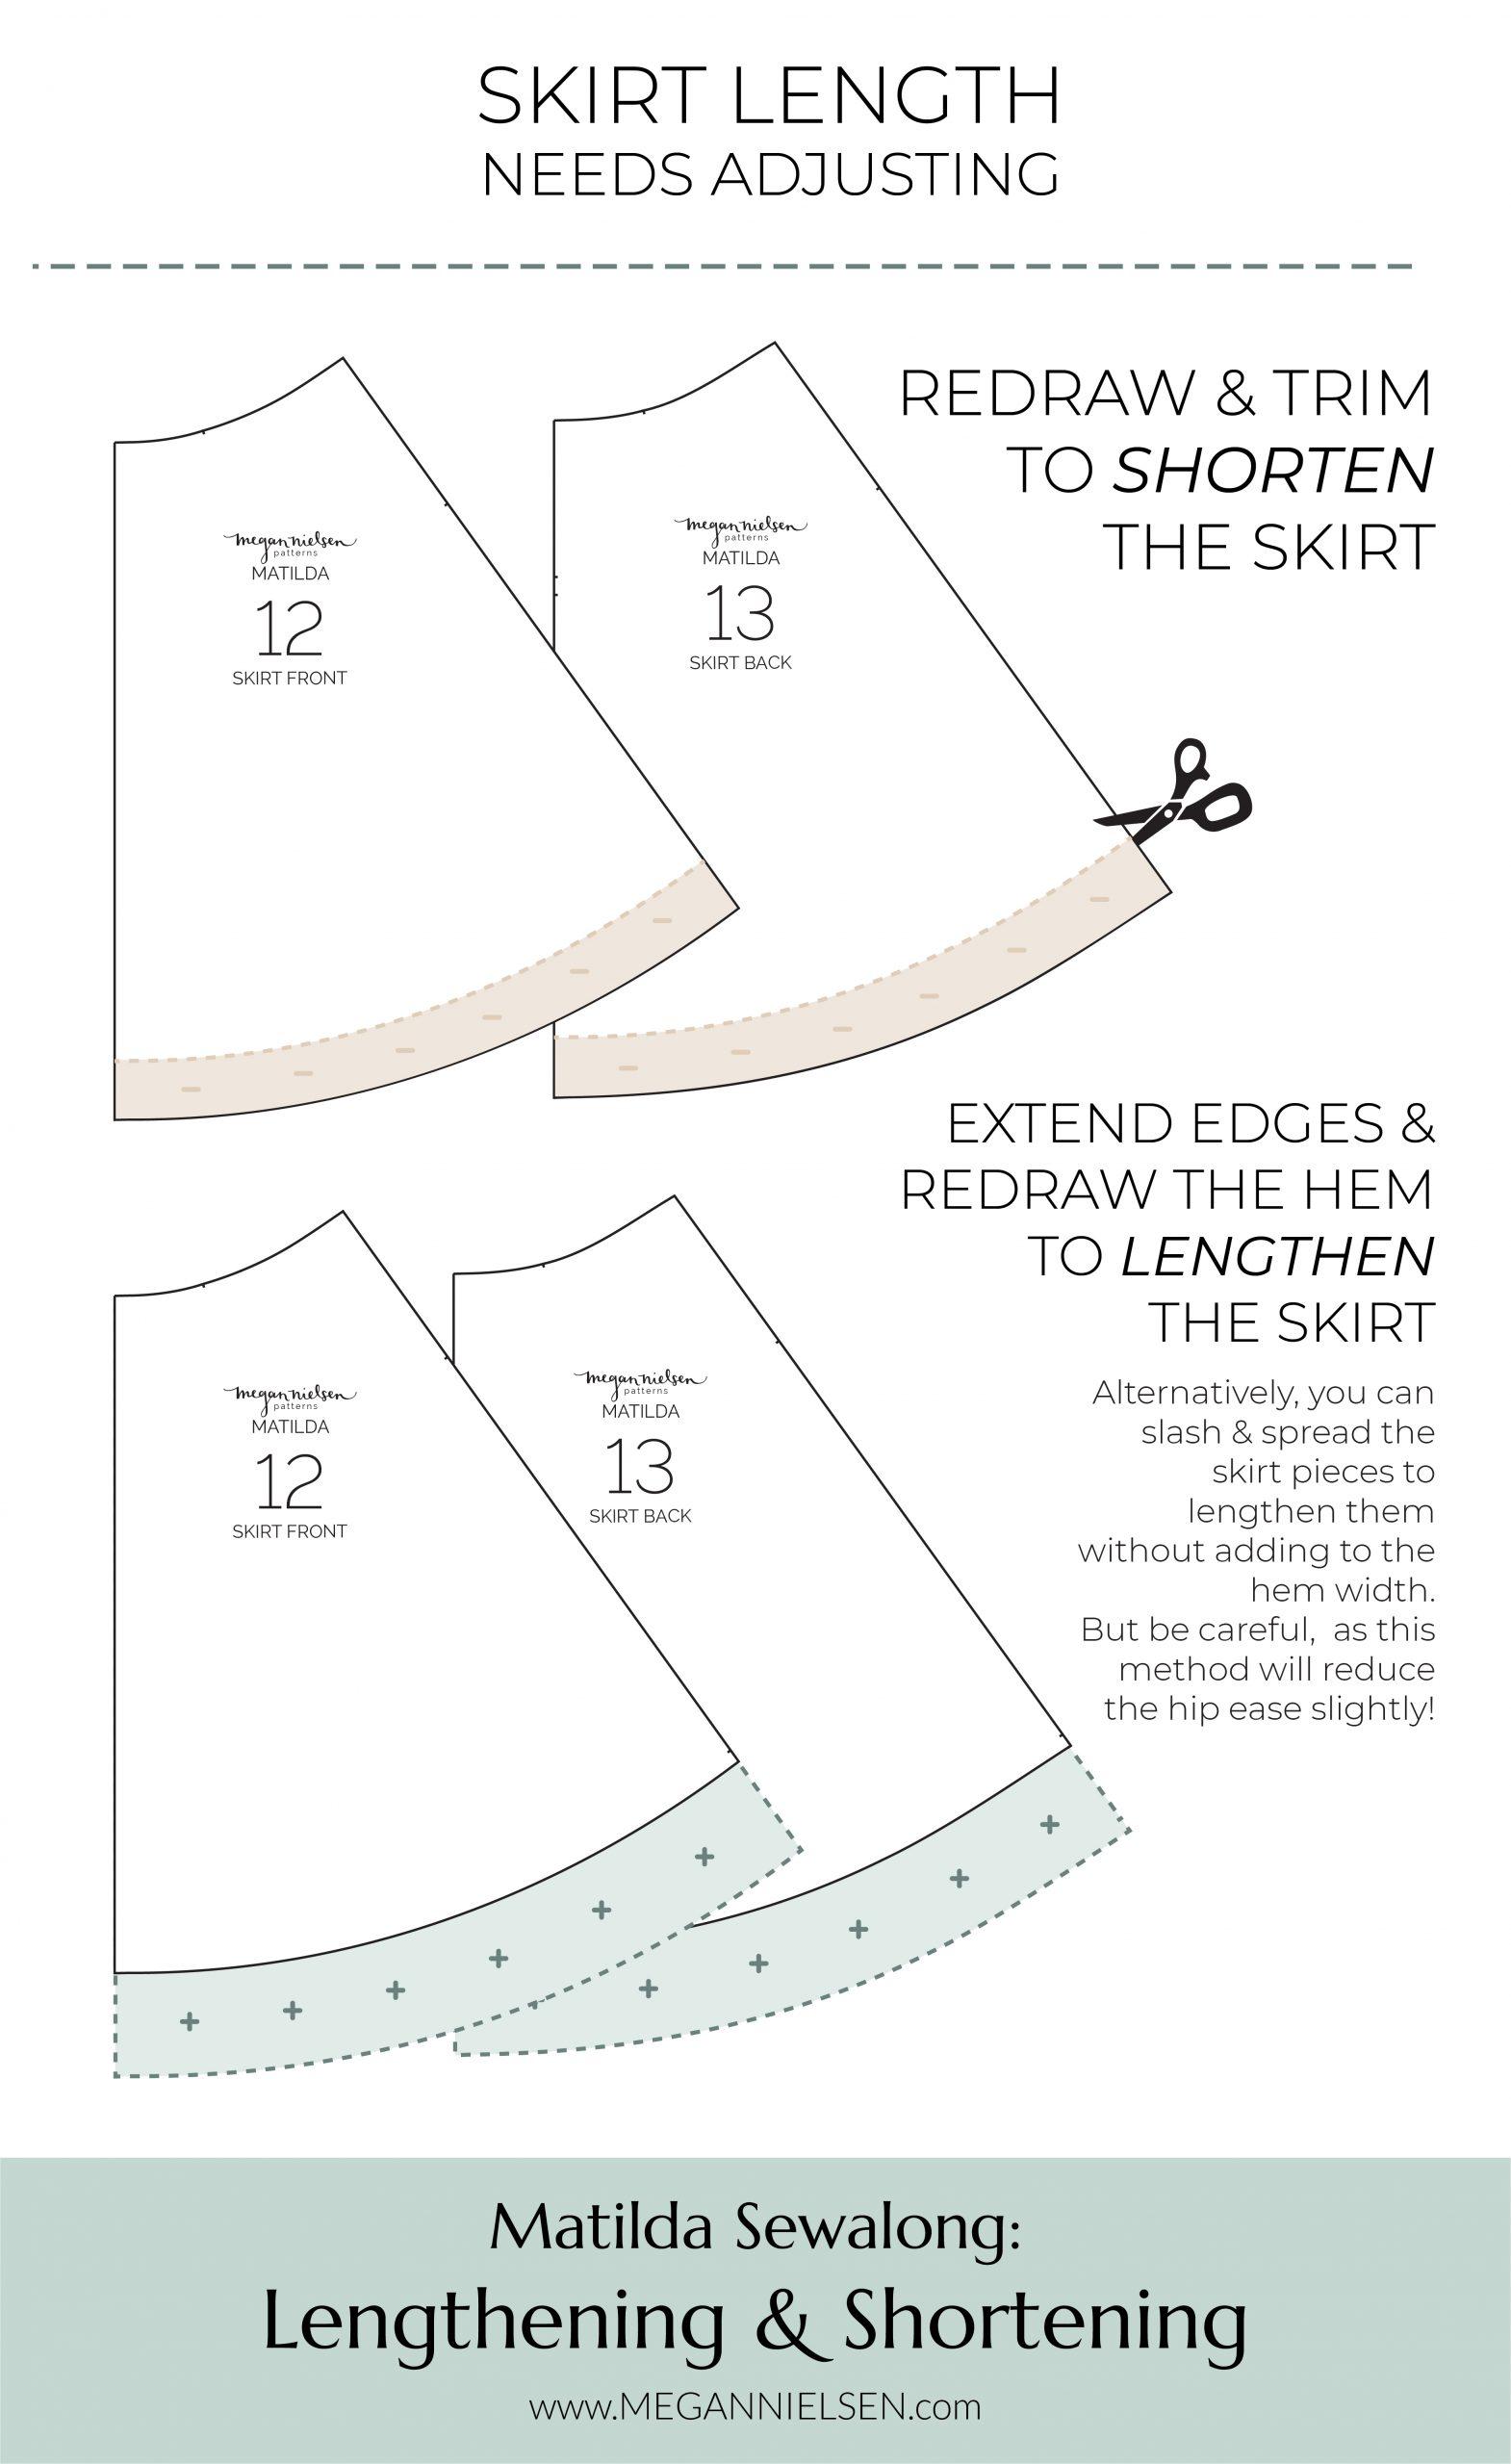 Megan Nielsen Patterns | Matilda Sewalong: Lengthening & Shortening - Adjusting The Skirt Length